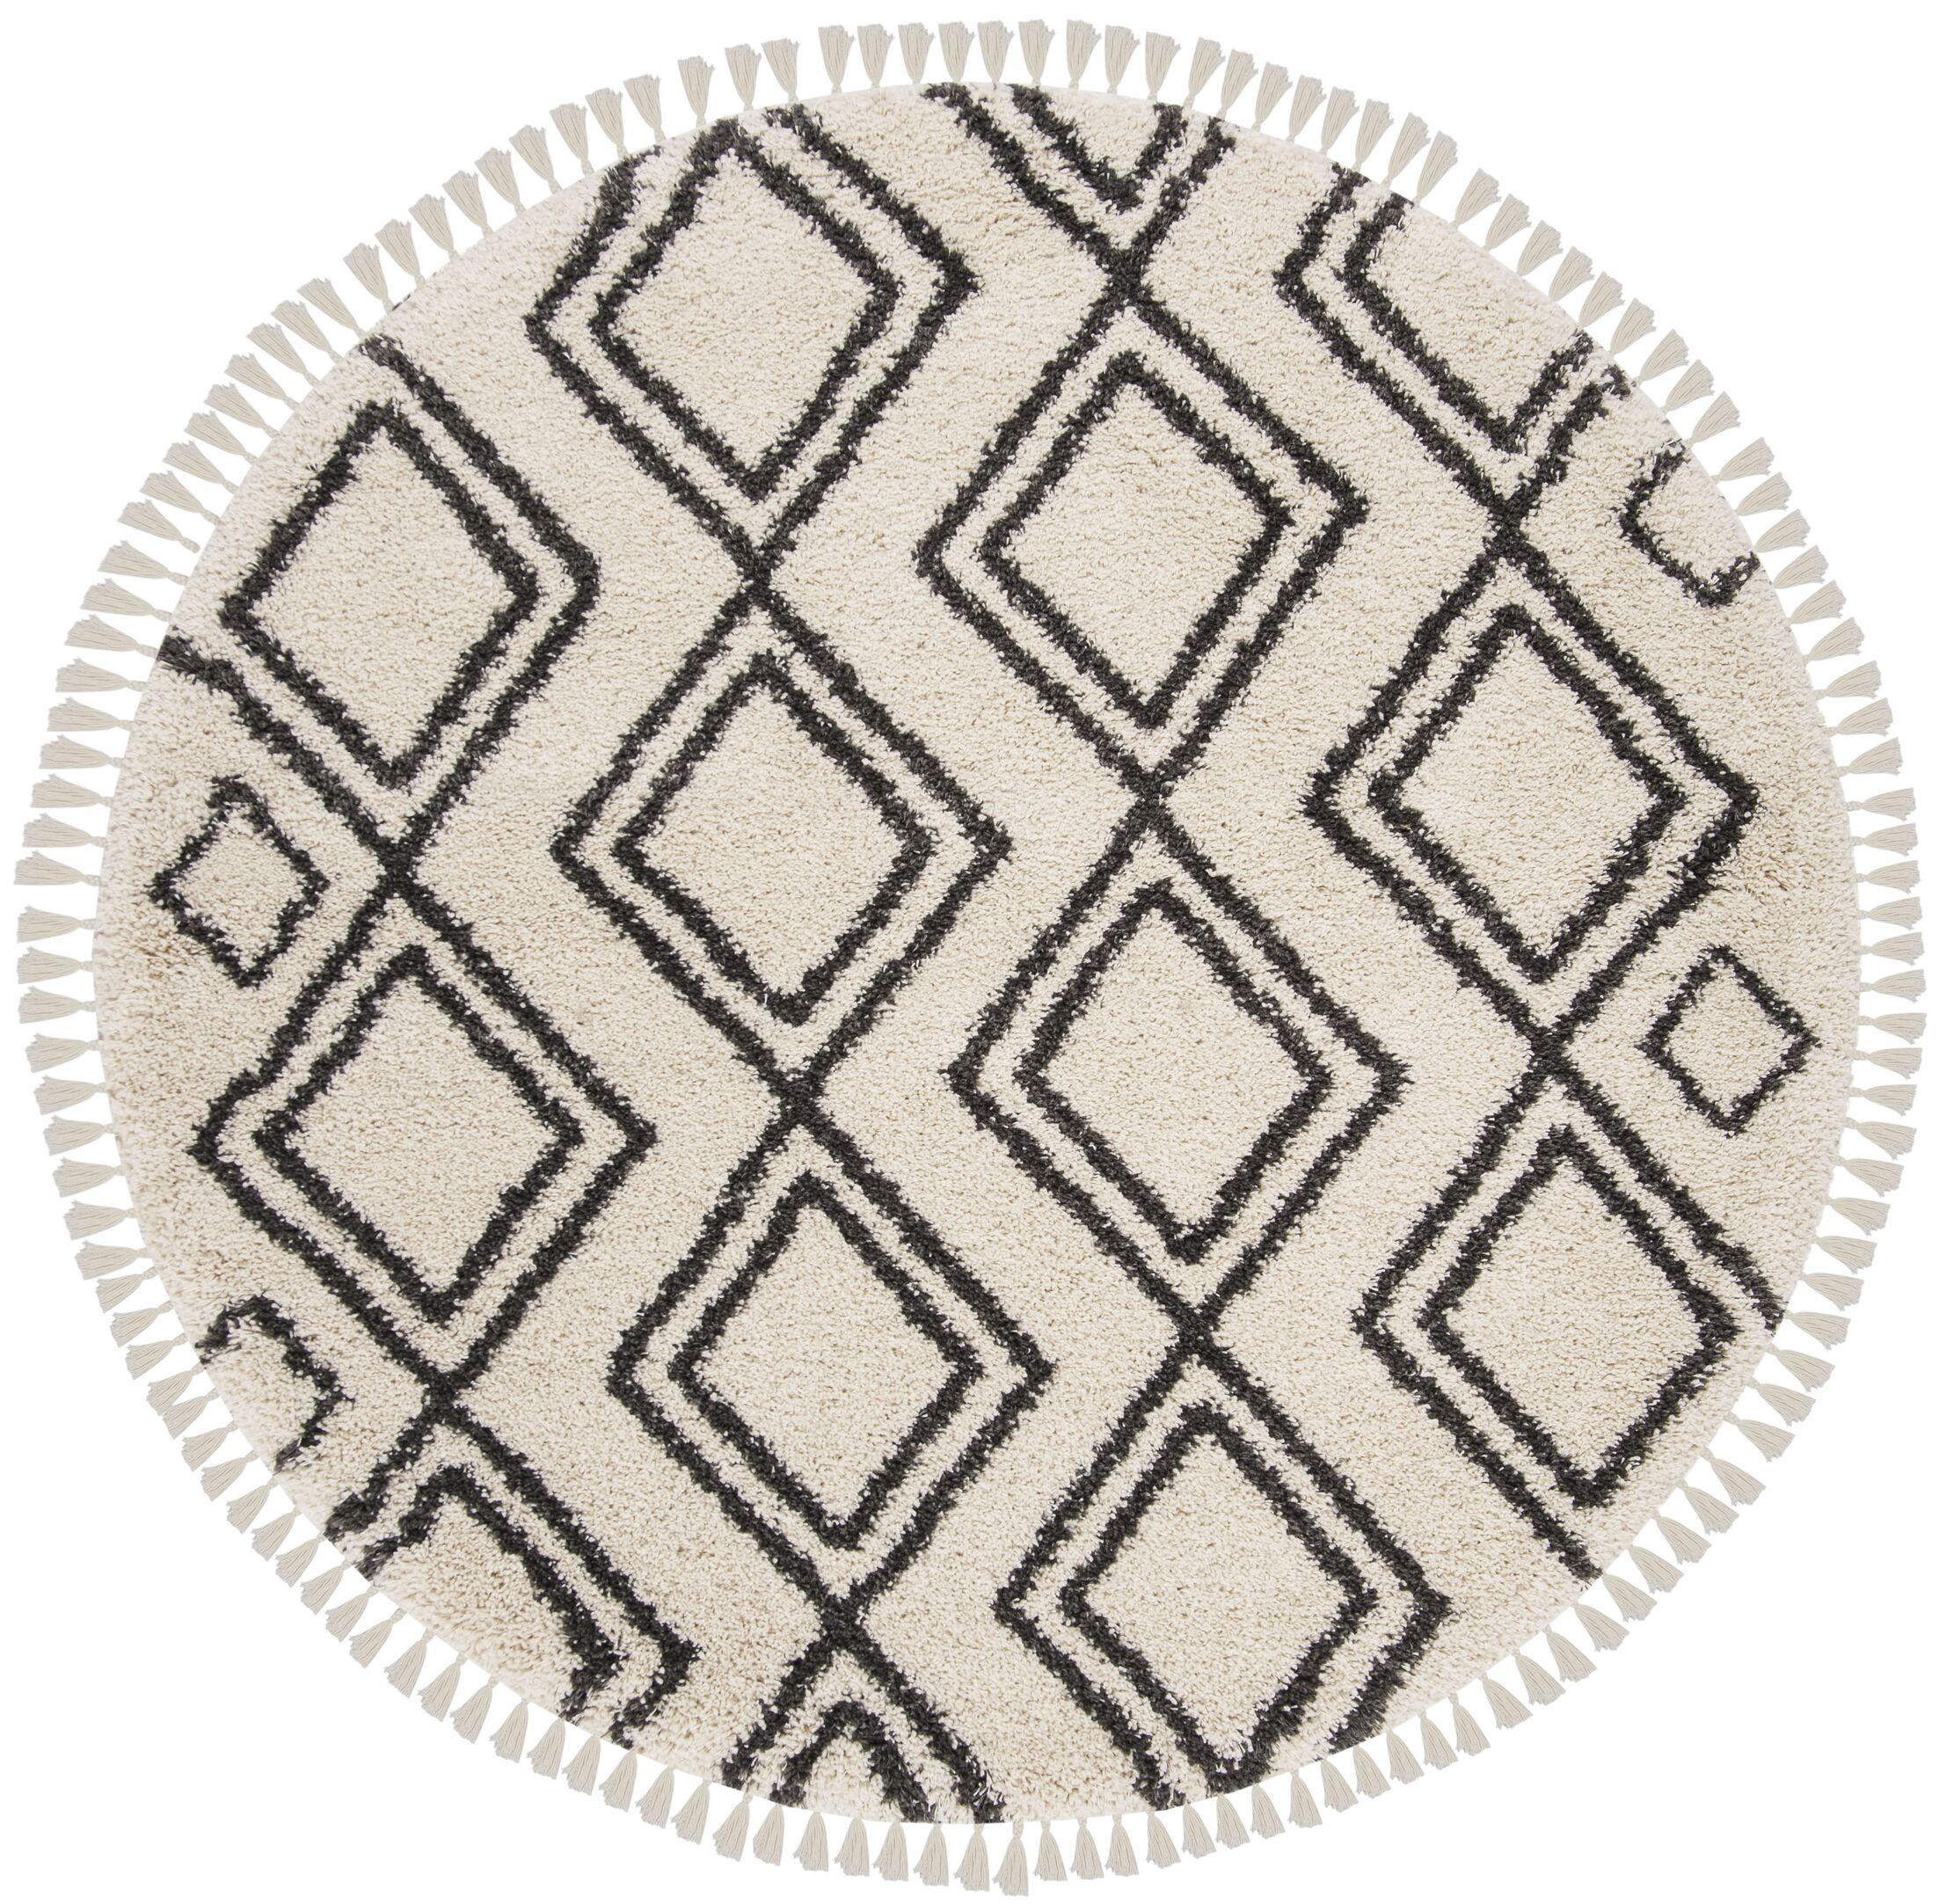 Morgan Black/Beige Area Rug Rug Size: Round 6'7